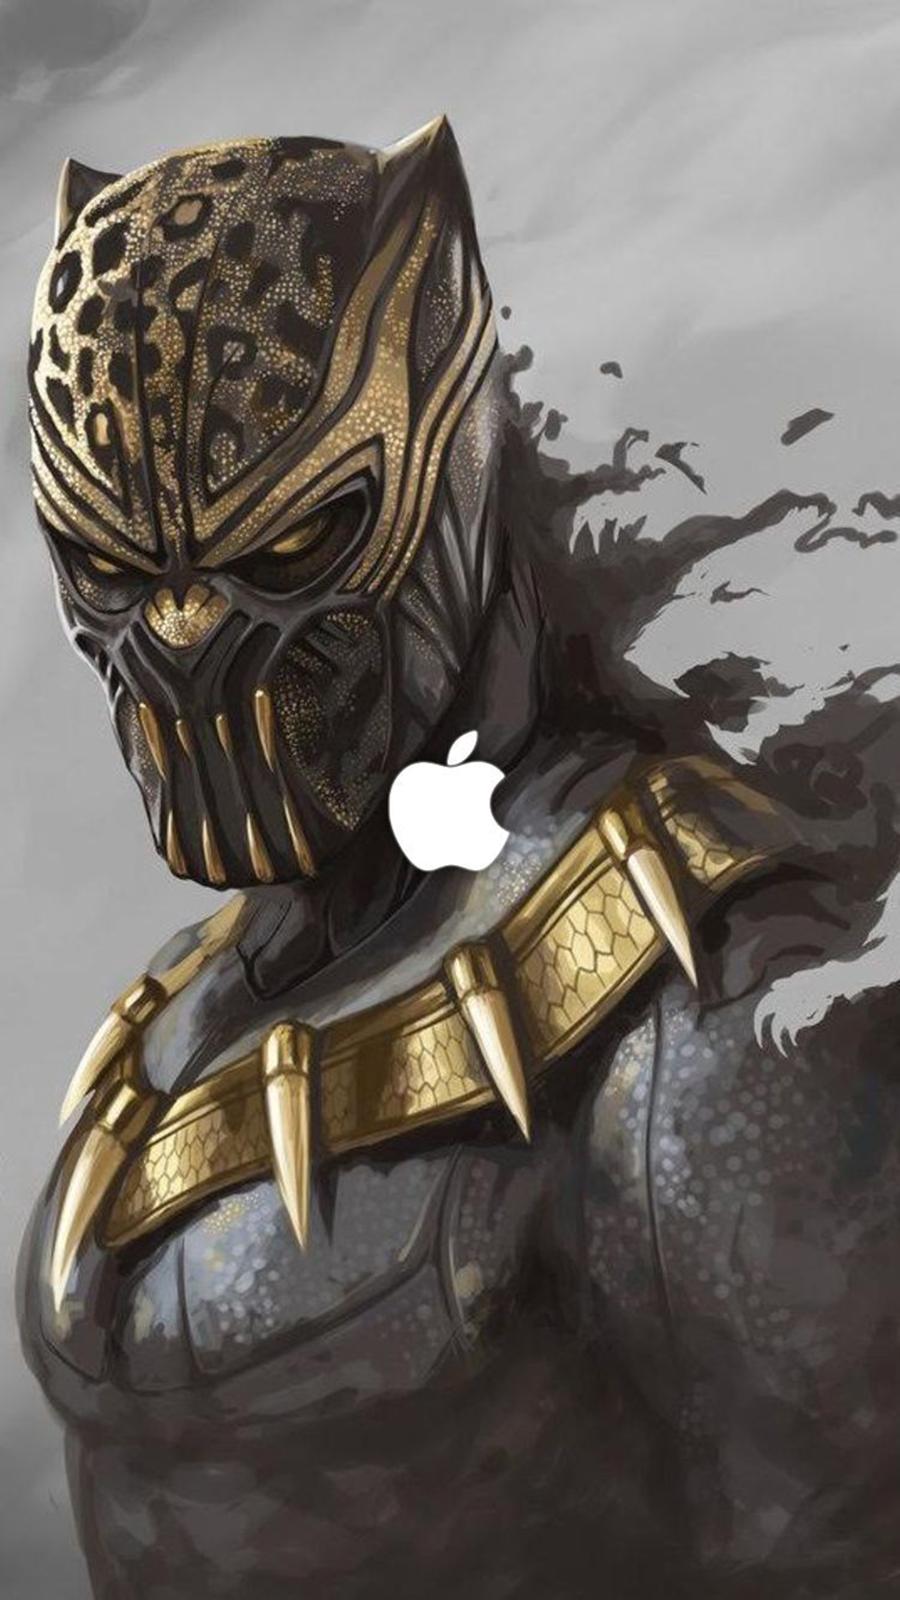 Monster People Wallpapers Download